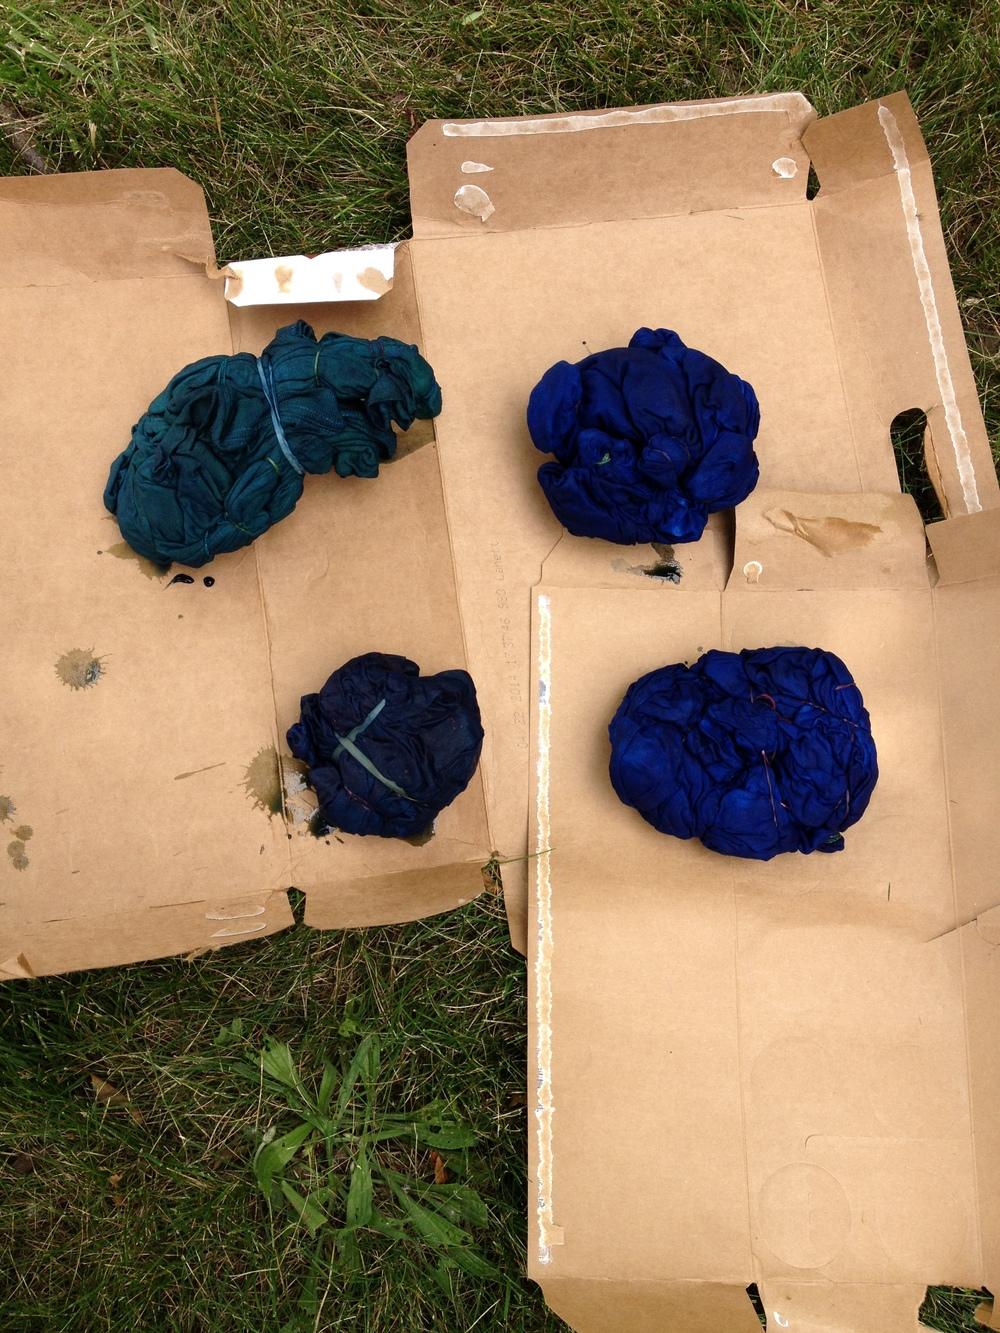 The indigo dye becomes more blue as it oxidizes.